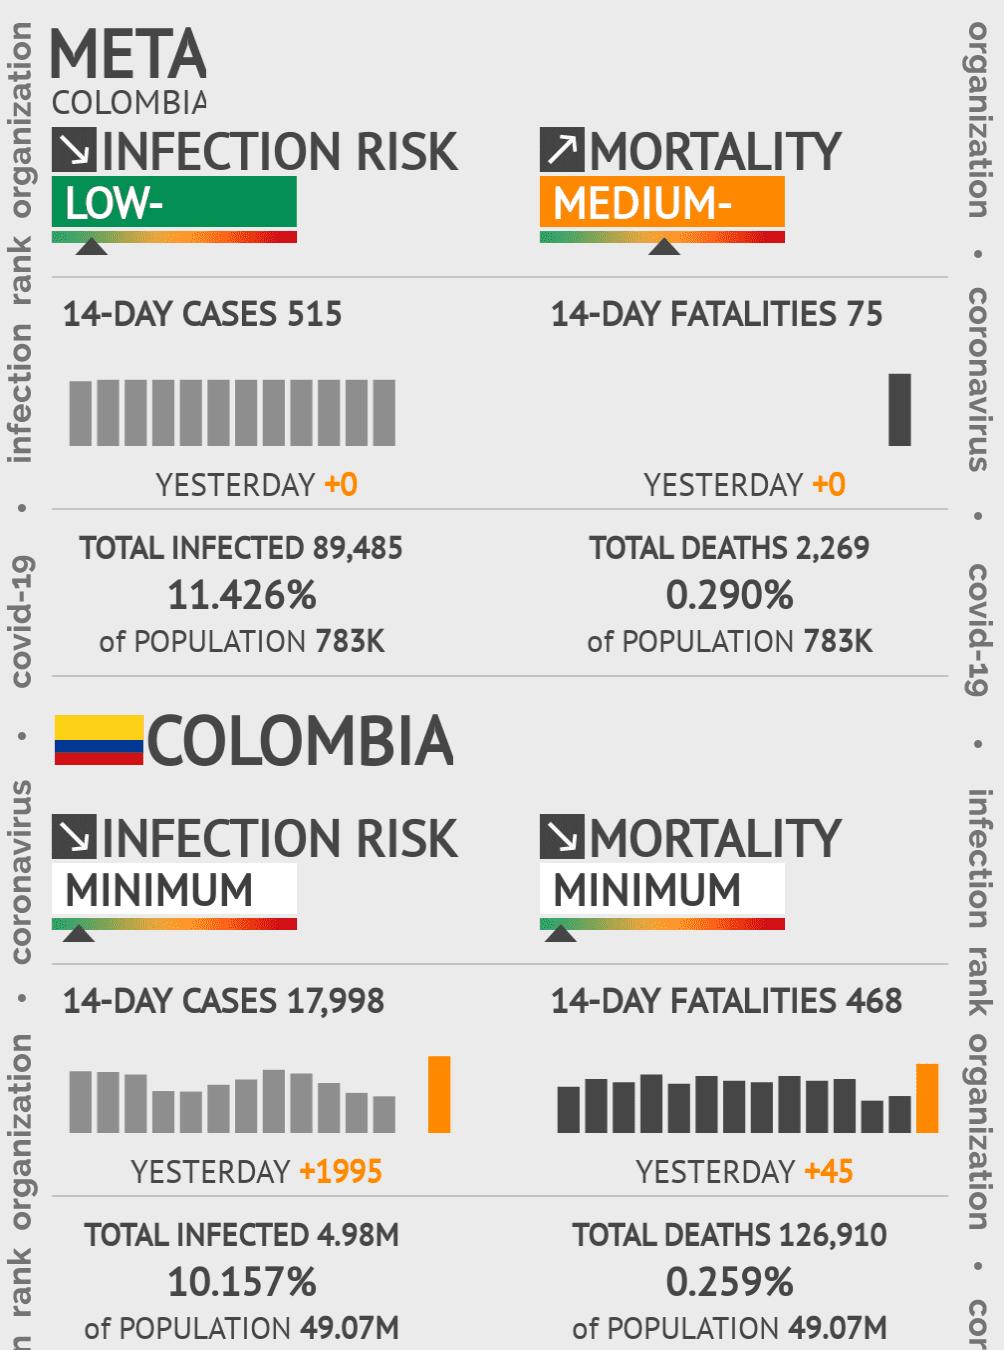 Meta Coronavirus Covid-19 Risk of Infection on March 06, 2021